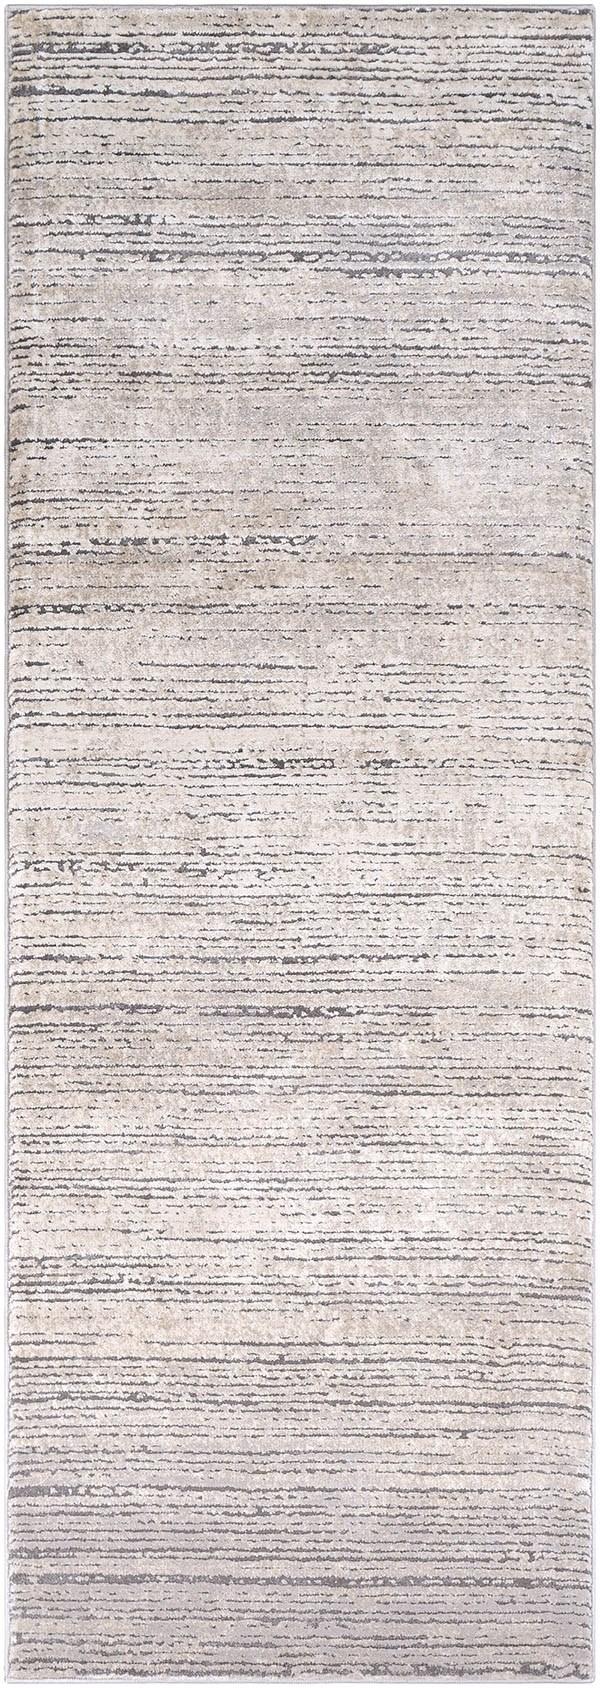 Khaki, Taupe, Medium Grey, Ivory Contemporary / Modern Area Rug